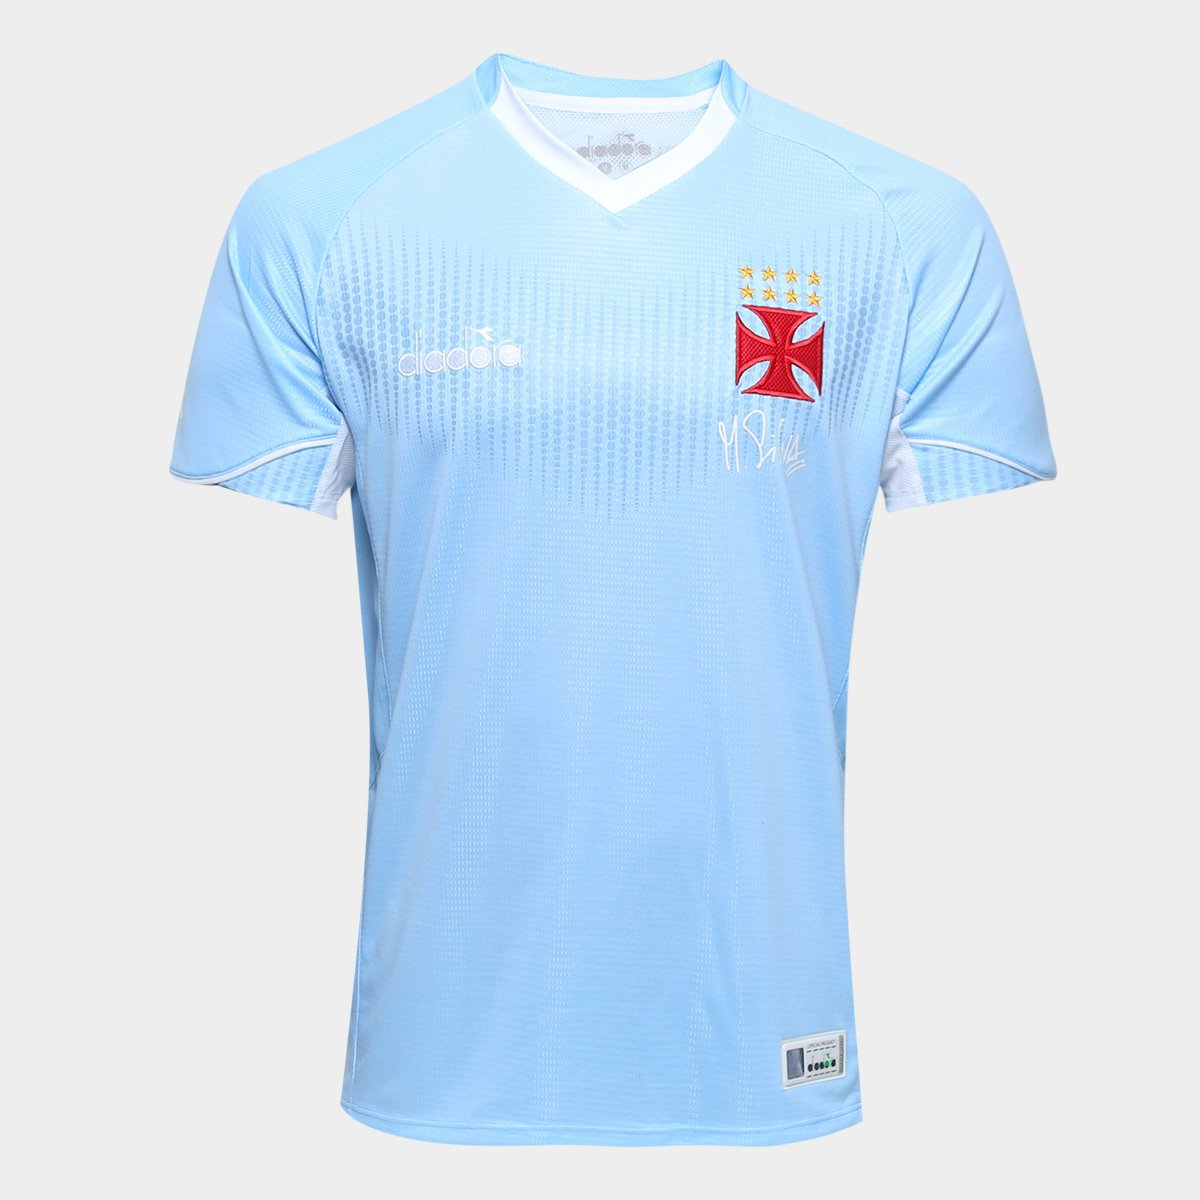 Camisa de Goleiro Vasco I 2018 s n° Torcedor Diadora Masculina ... 6bf37b54ba0bd